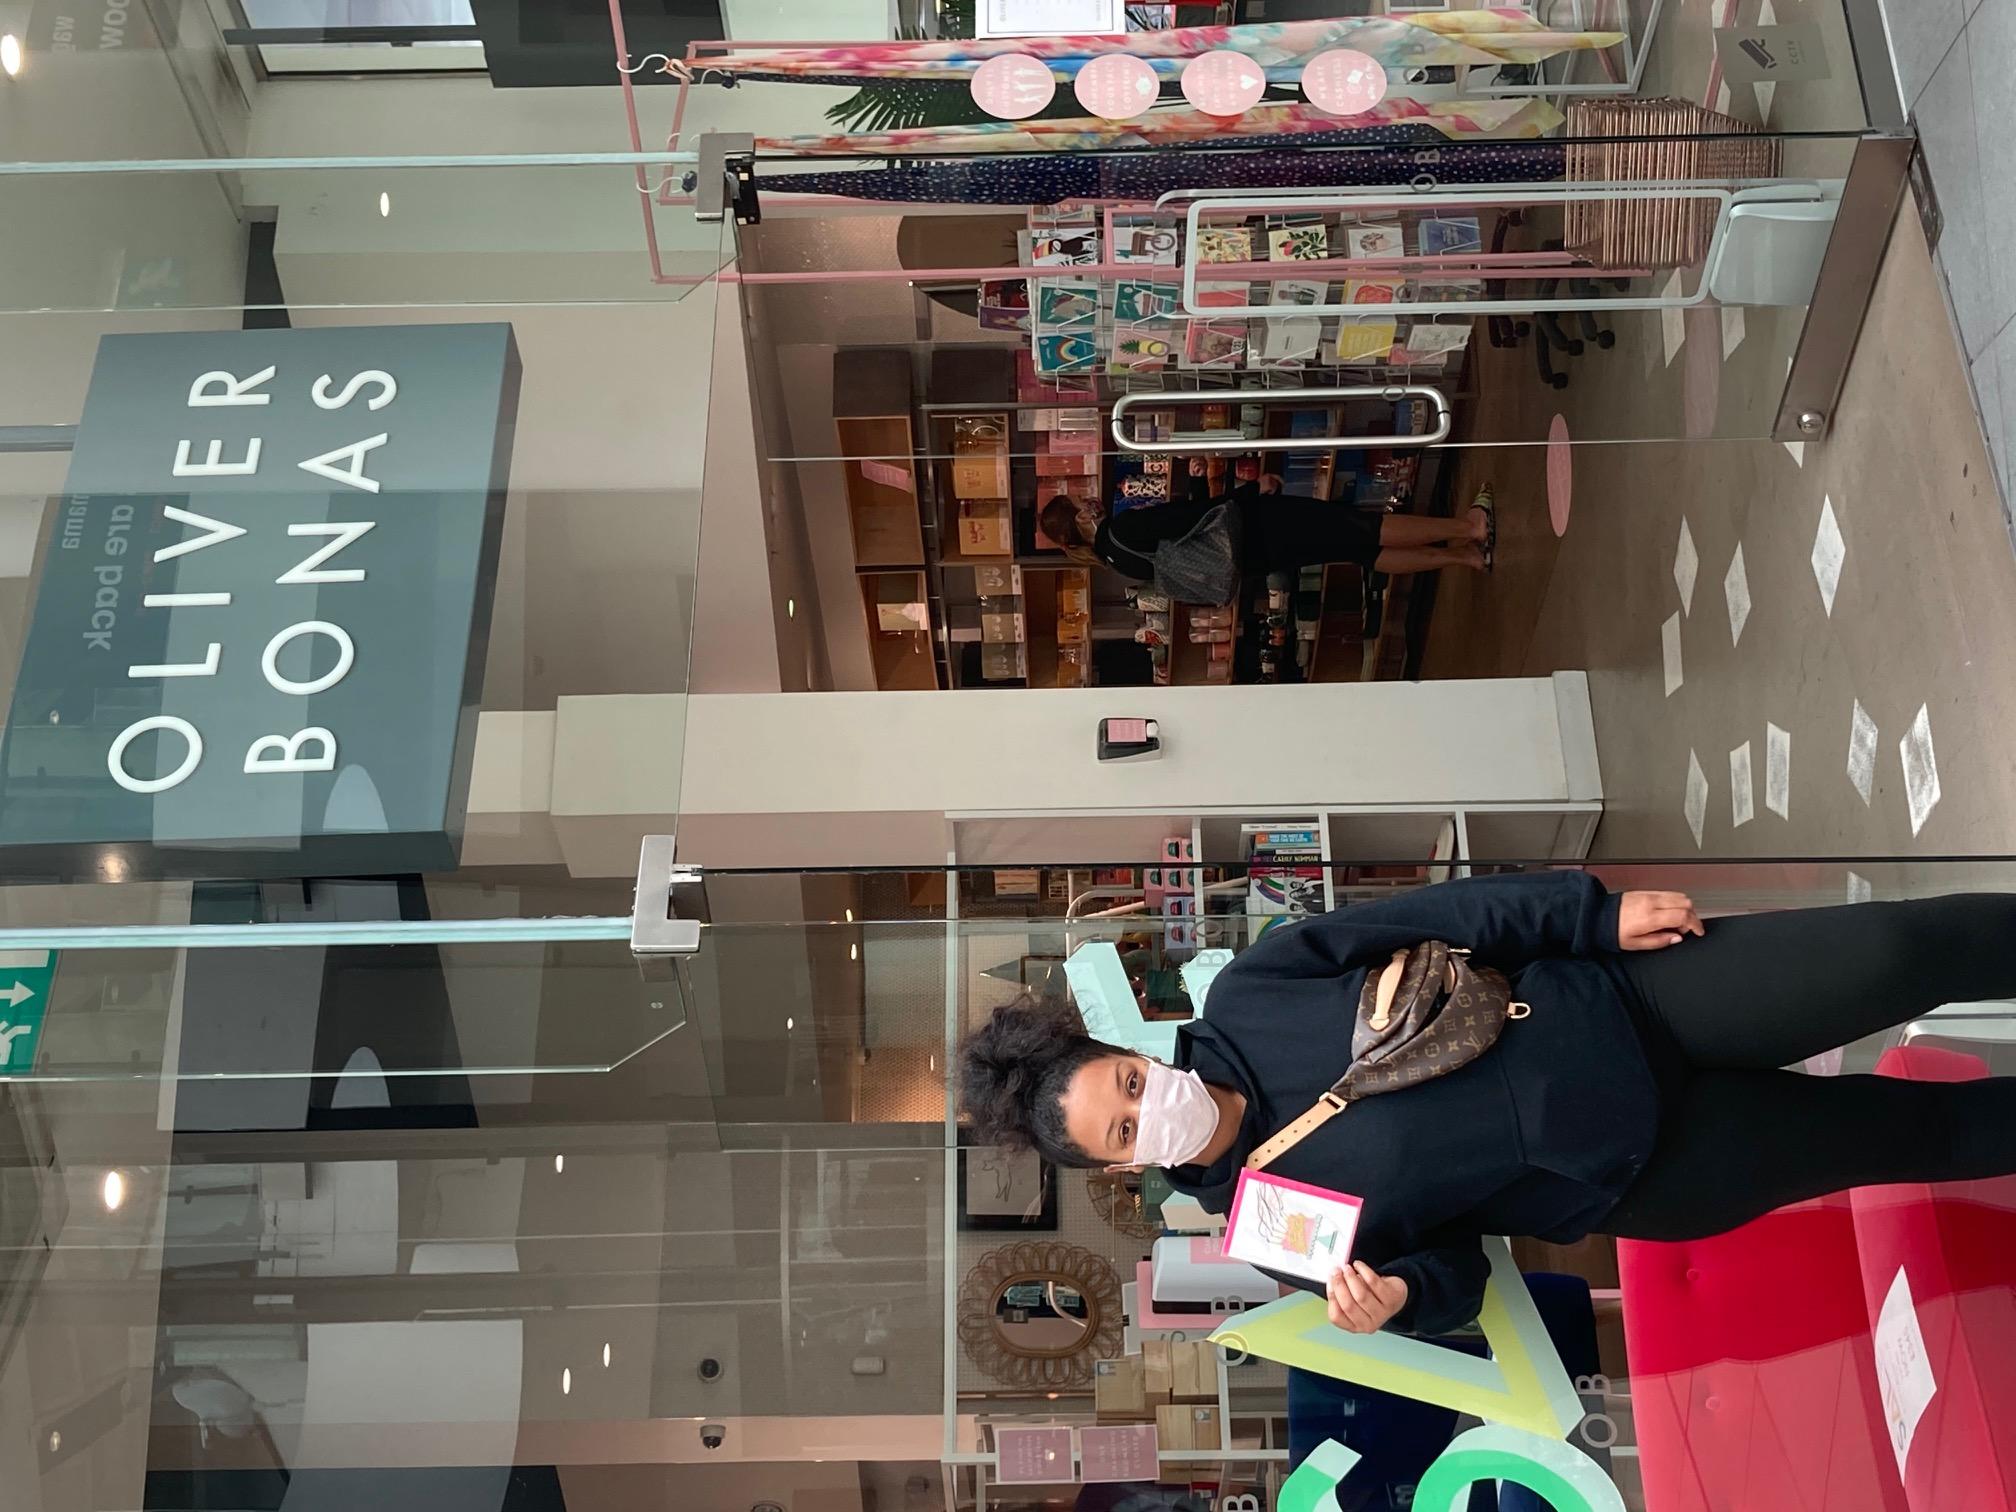 Above: Musharrifa outside her local Oliver Bonas store.